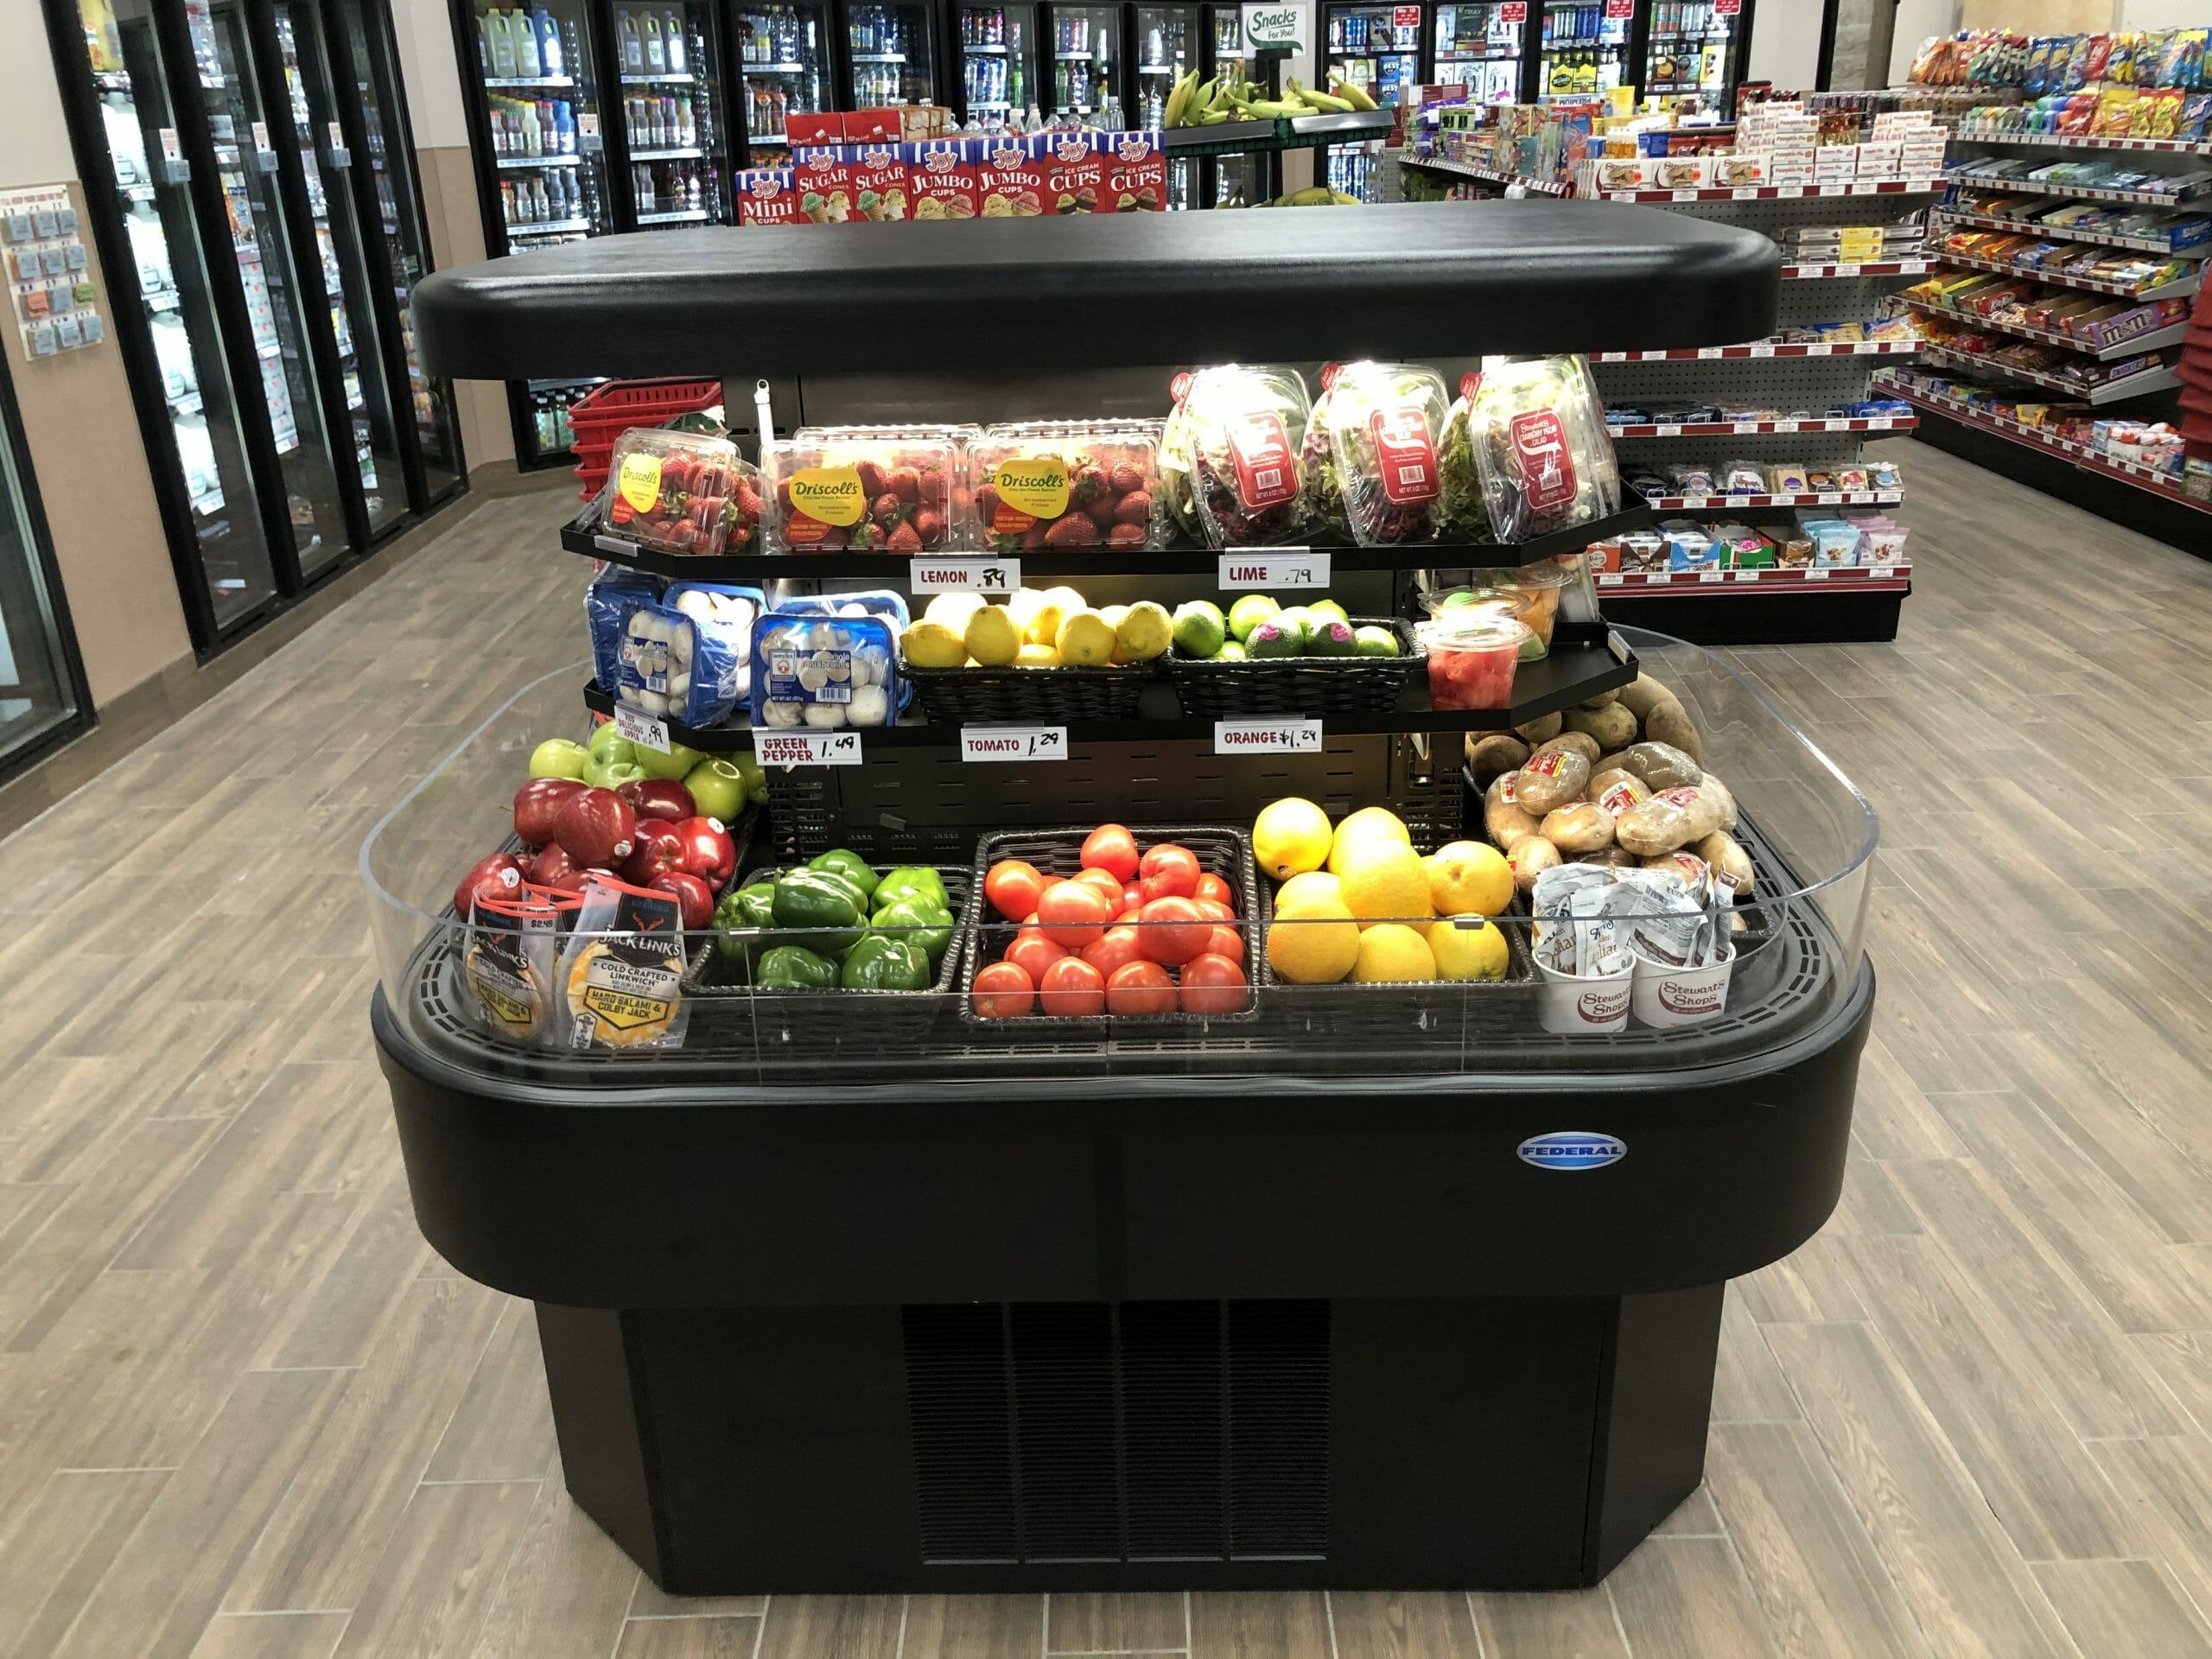 Open fruit and veggie refrigerator